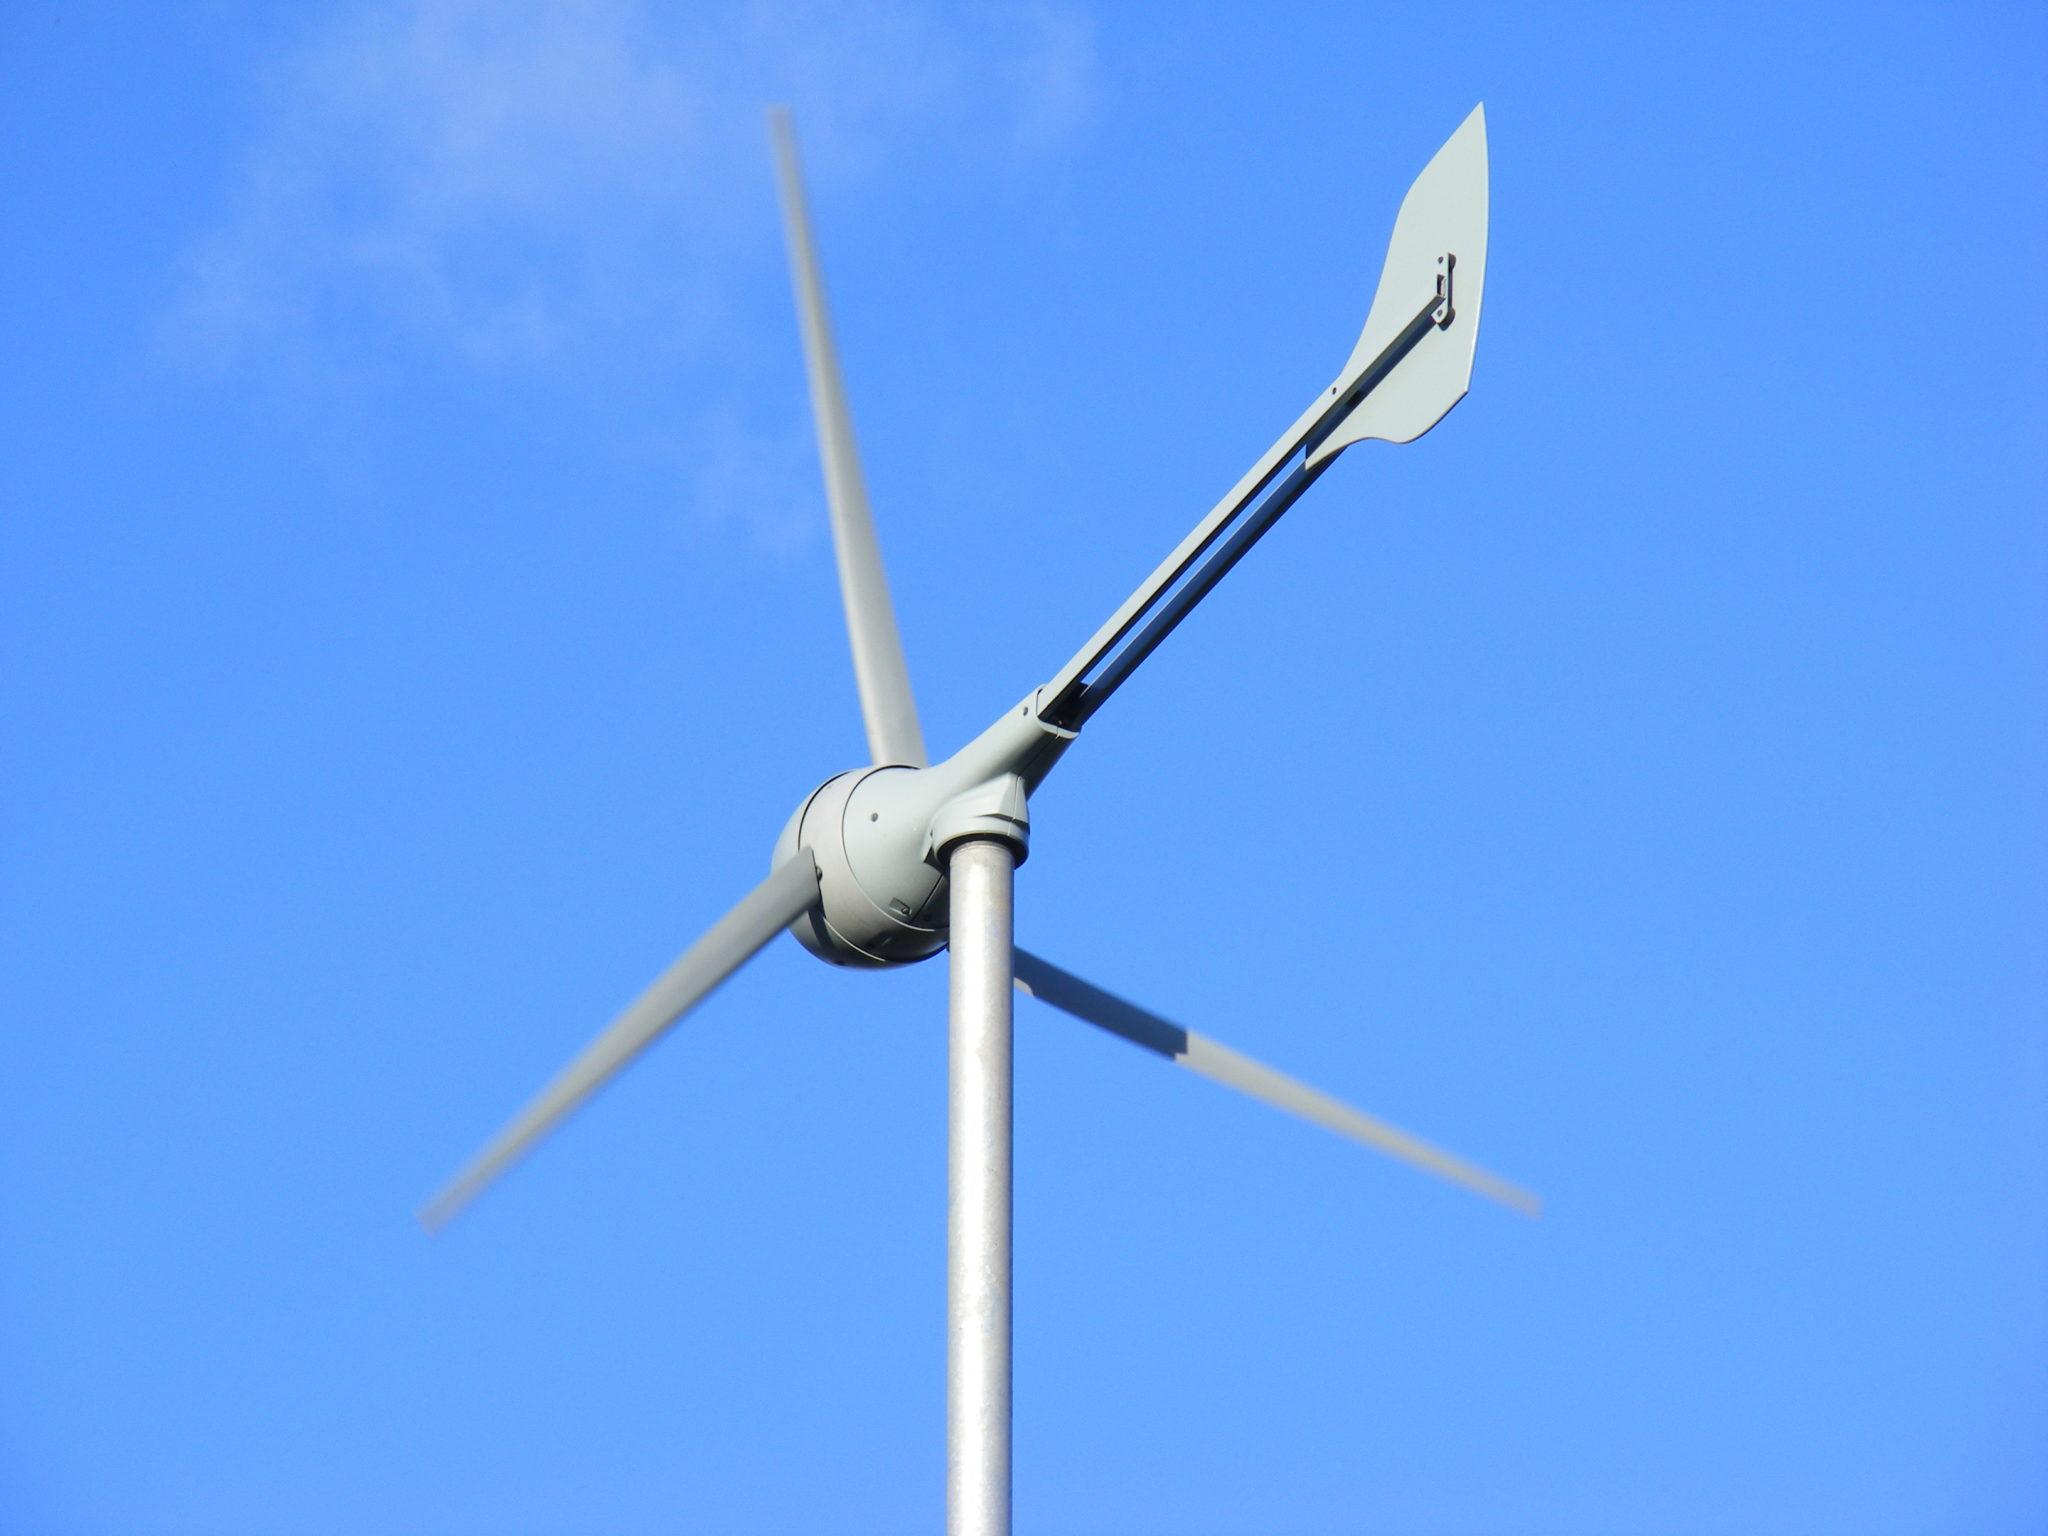 installer une éolienne horizontale